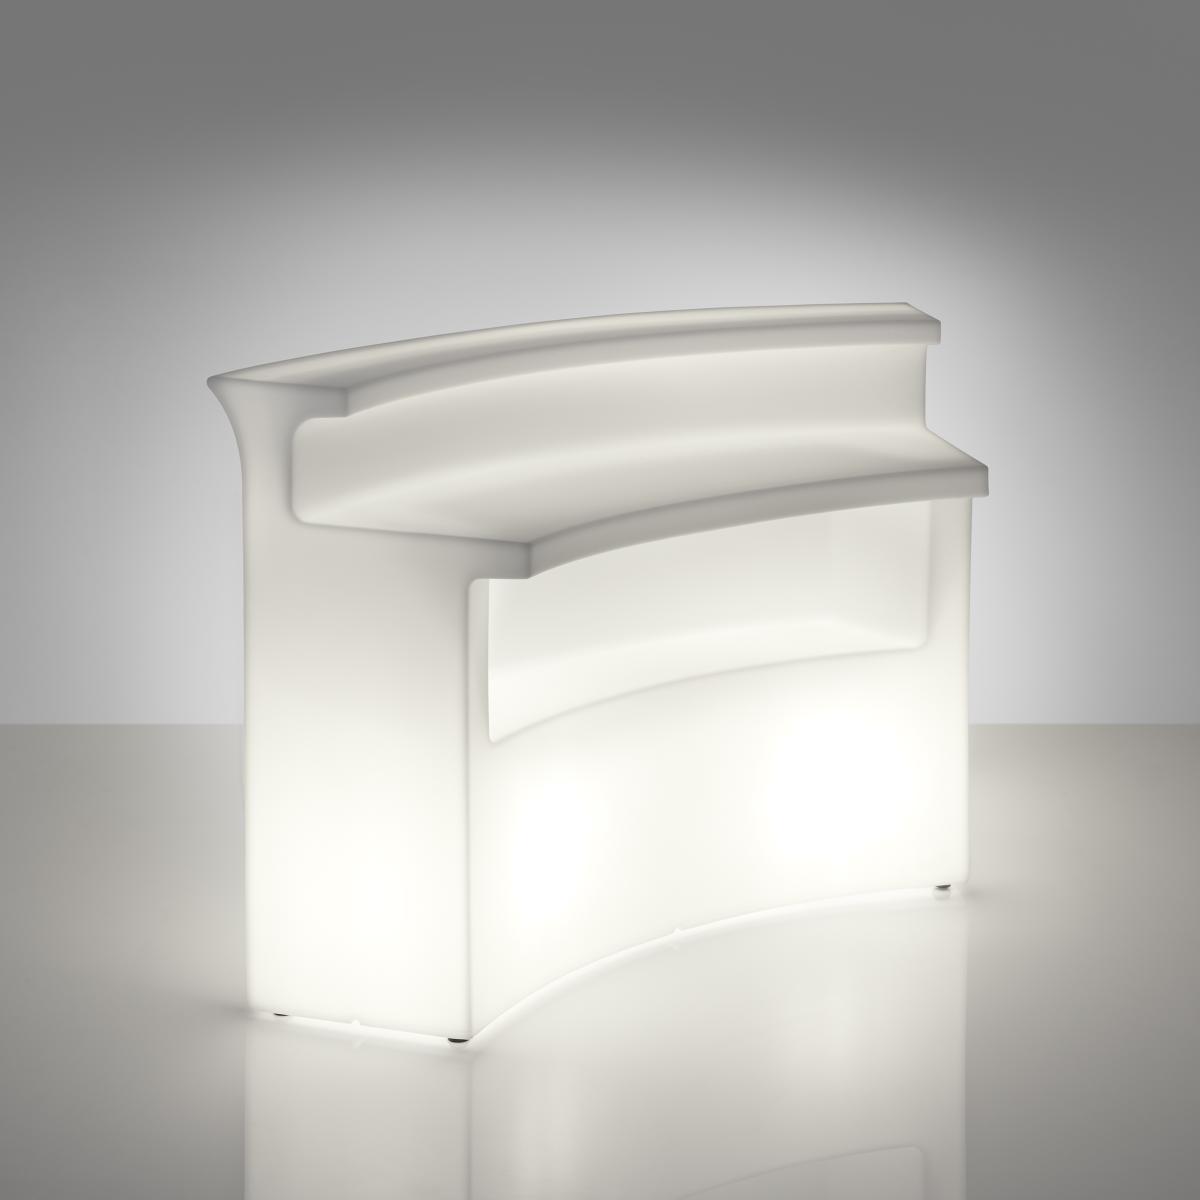 Beleuchtete Bars / Theken Shop